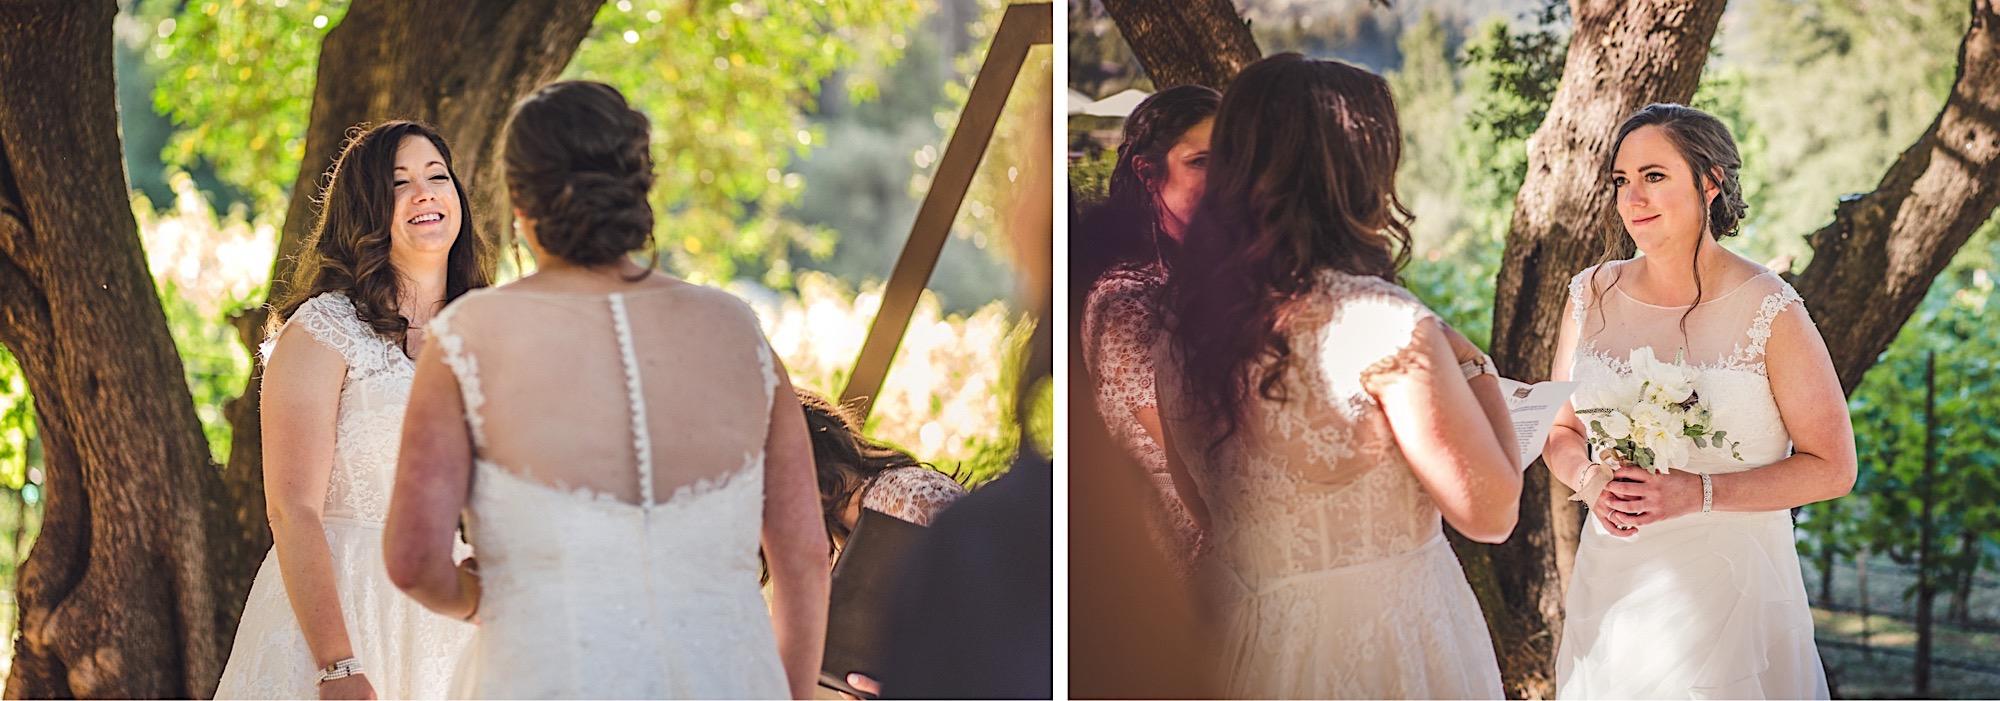 27_wedding_Sonoma_photographers.jpg